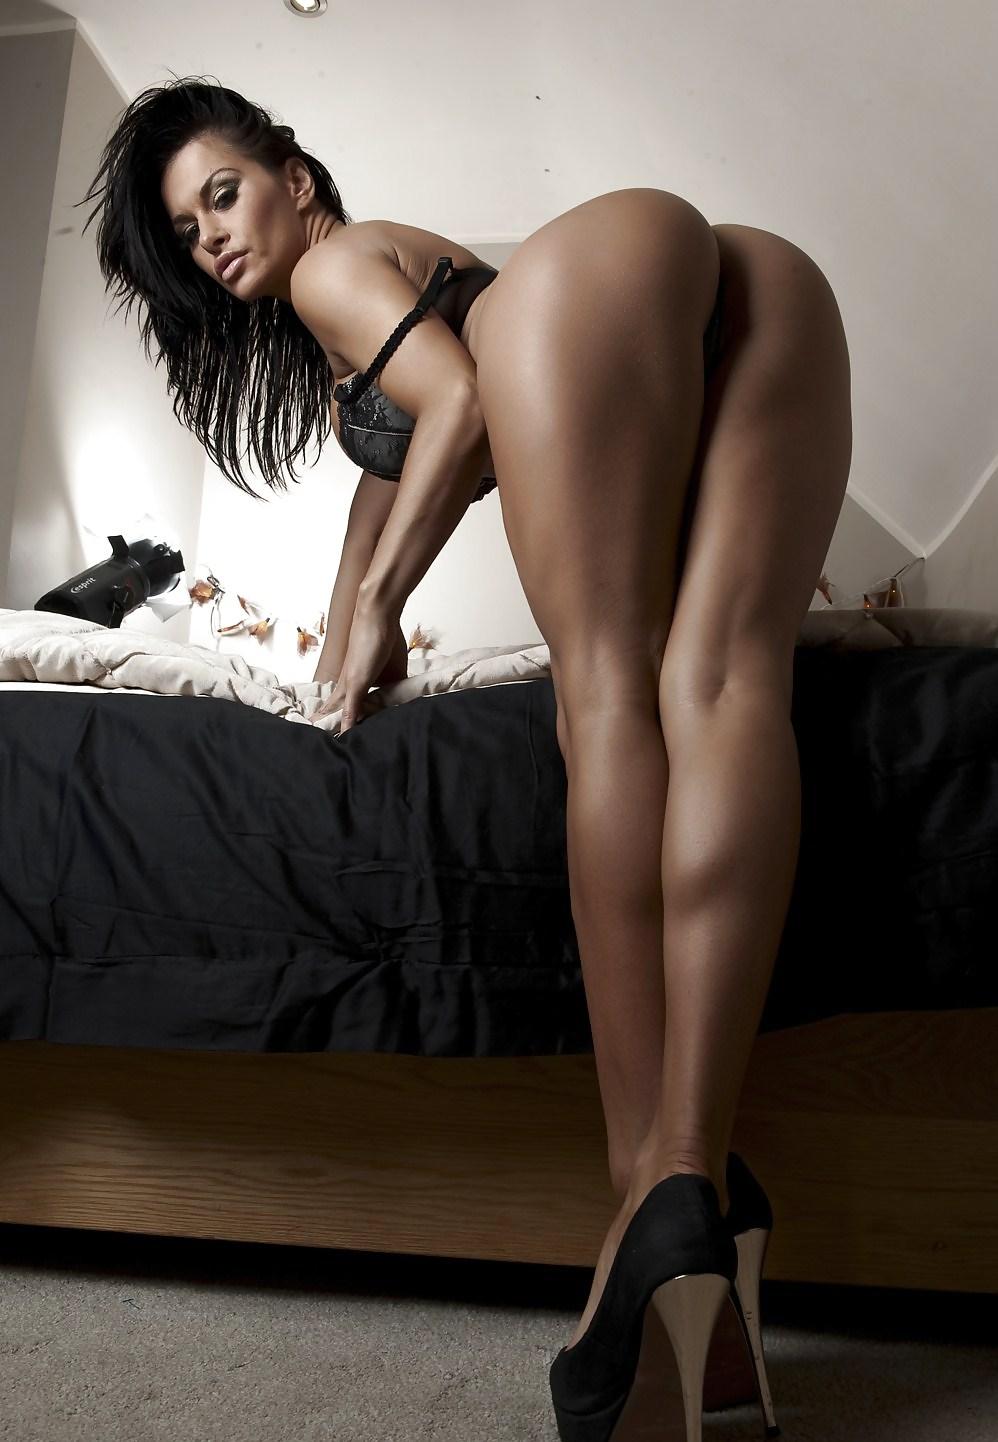 Dionne Mendez